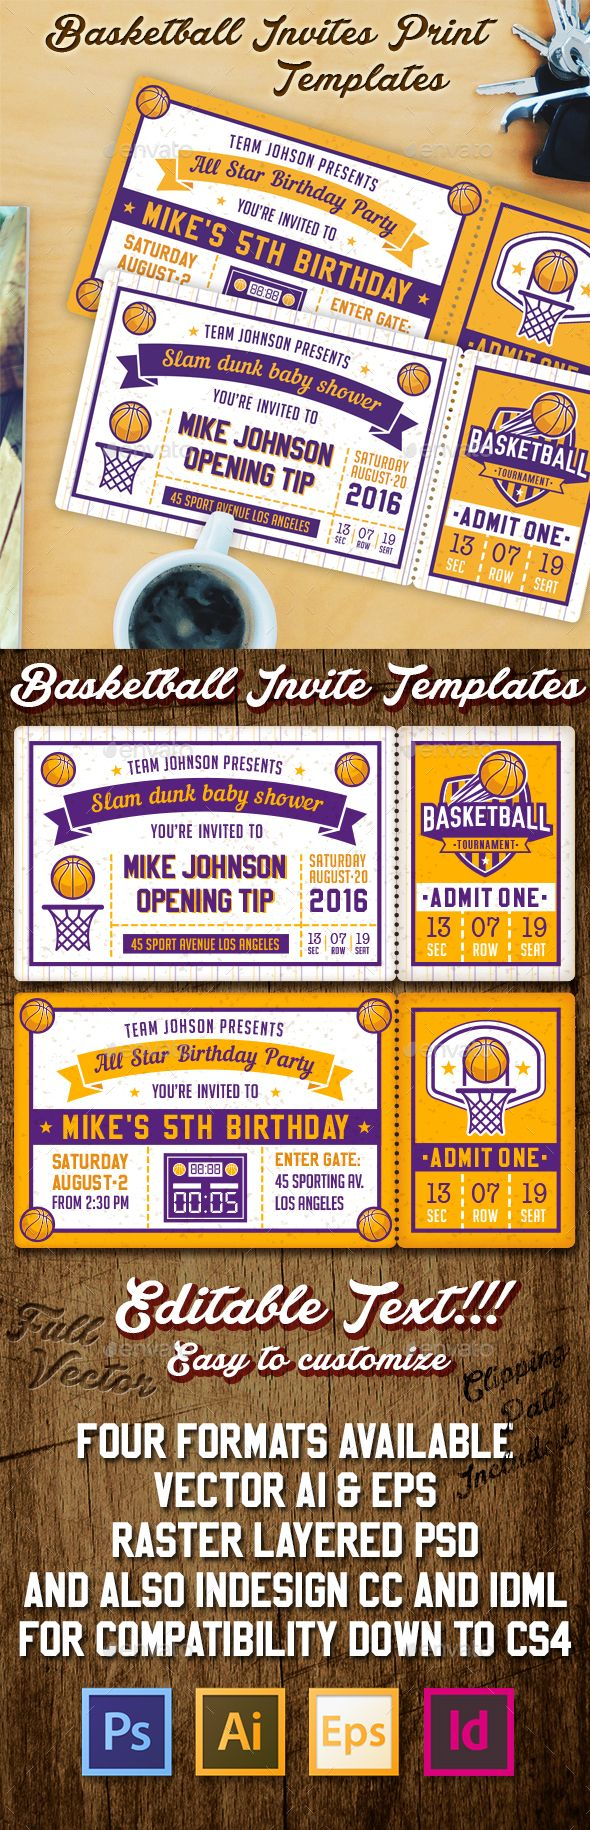 Basketball Invite Templates Invitations Cards &